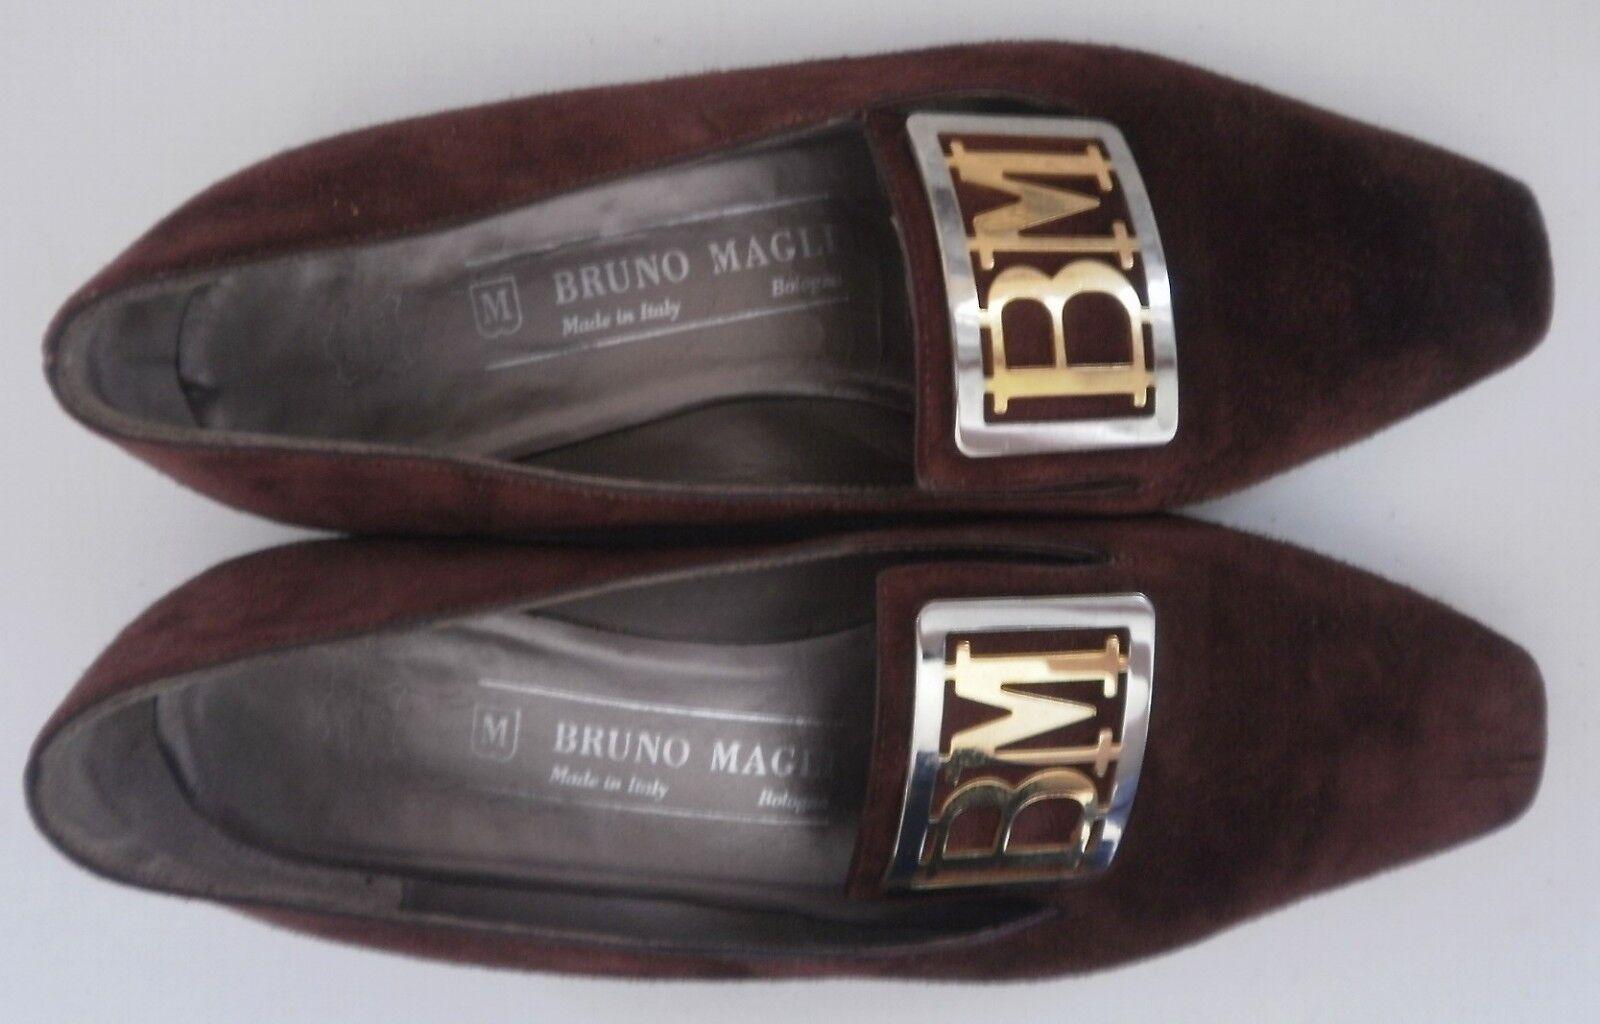 BRUNO MAGLI Damen Ballerinas Pumps made made made italy TRUE VINTAGE Slipper braun braun 9e70db